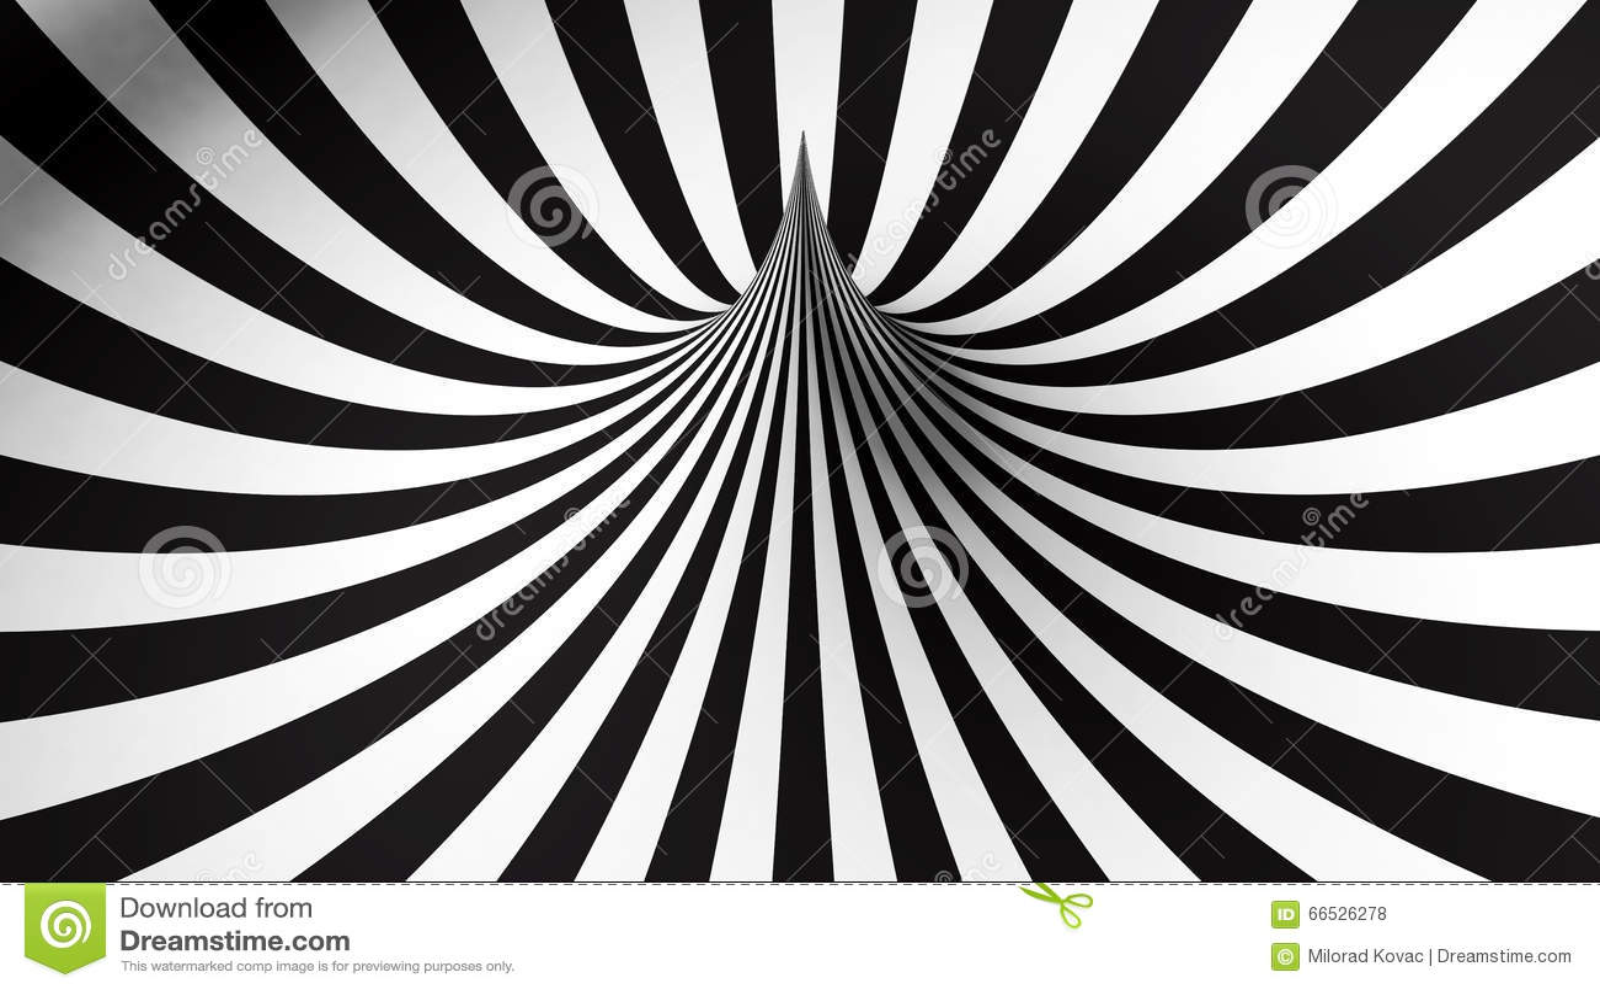 black and white geometric shape stock illustration illustration of digital motion 66526278. Black Bedroom Furniture Sets. Home Design Ideas